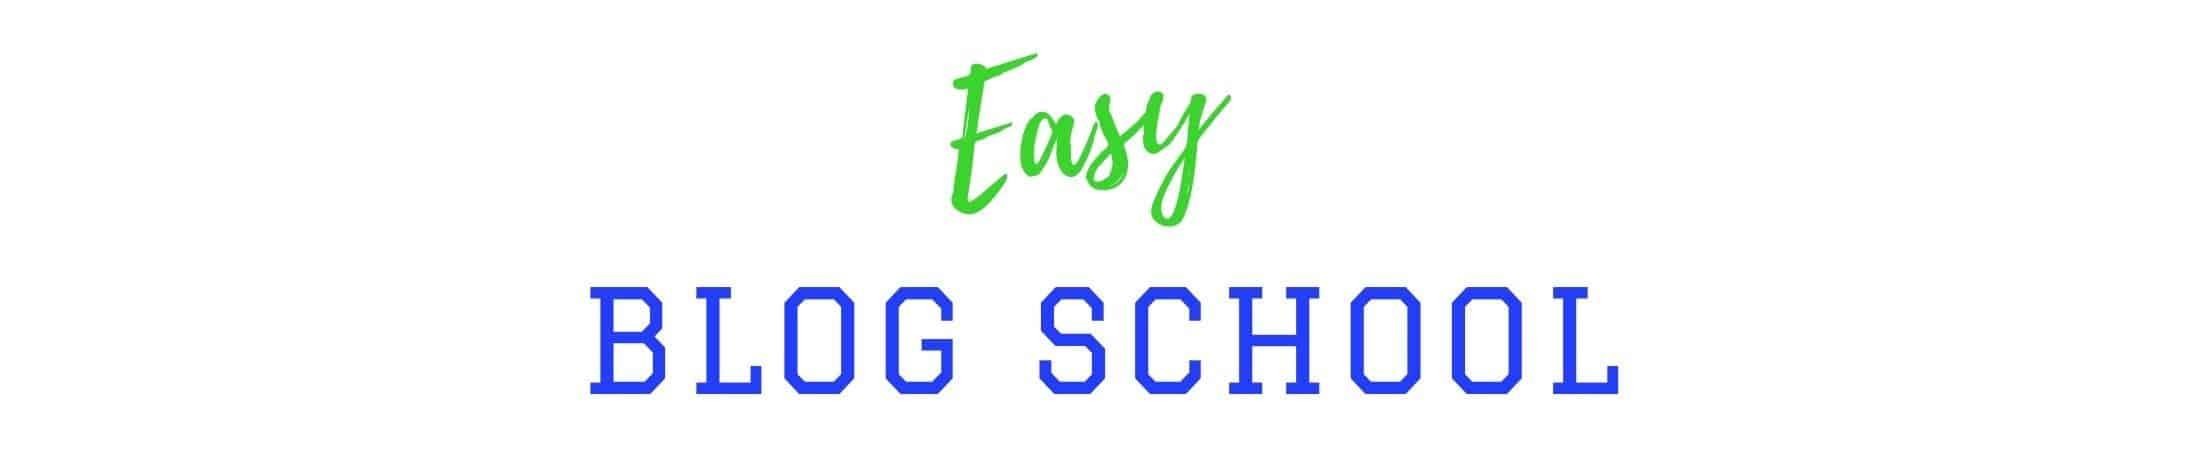 Easy Blog School